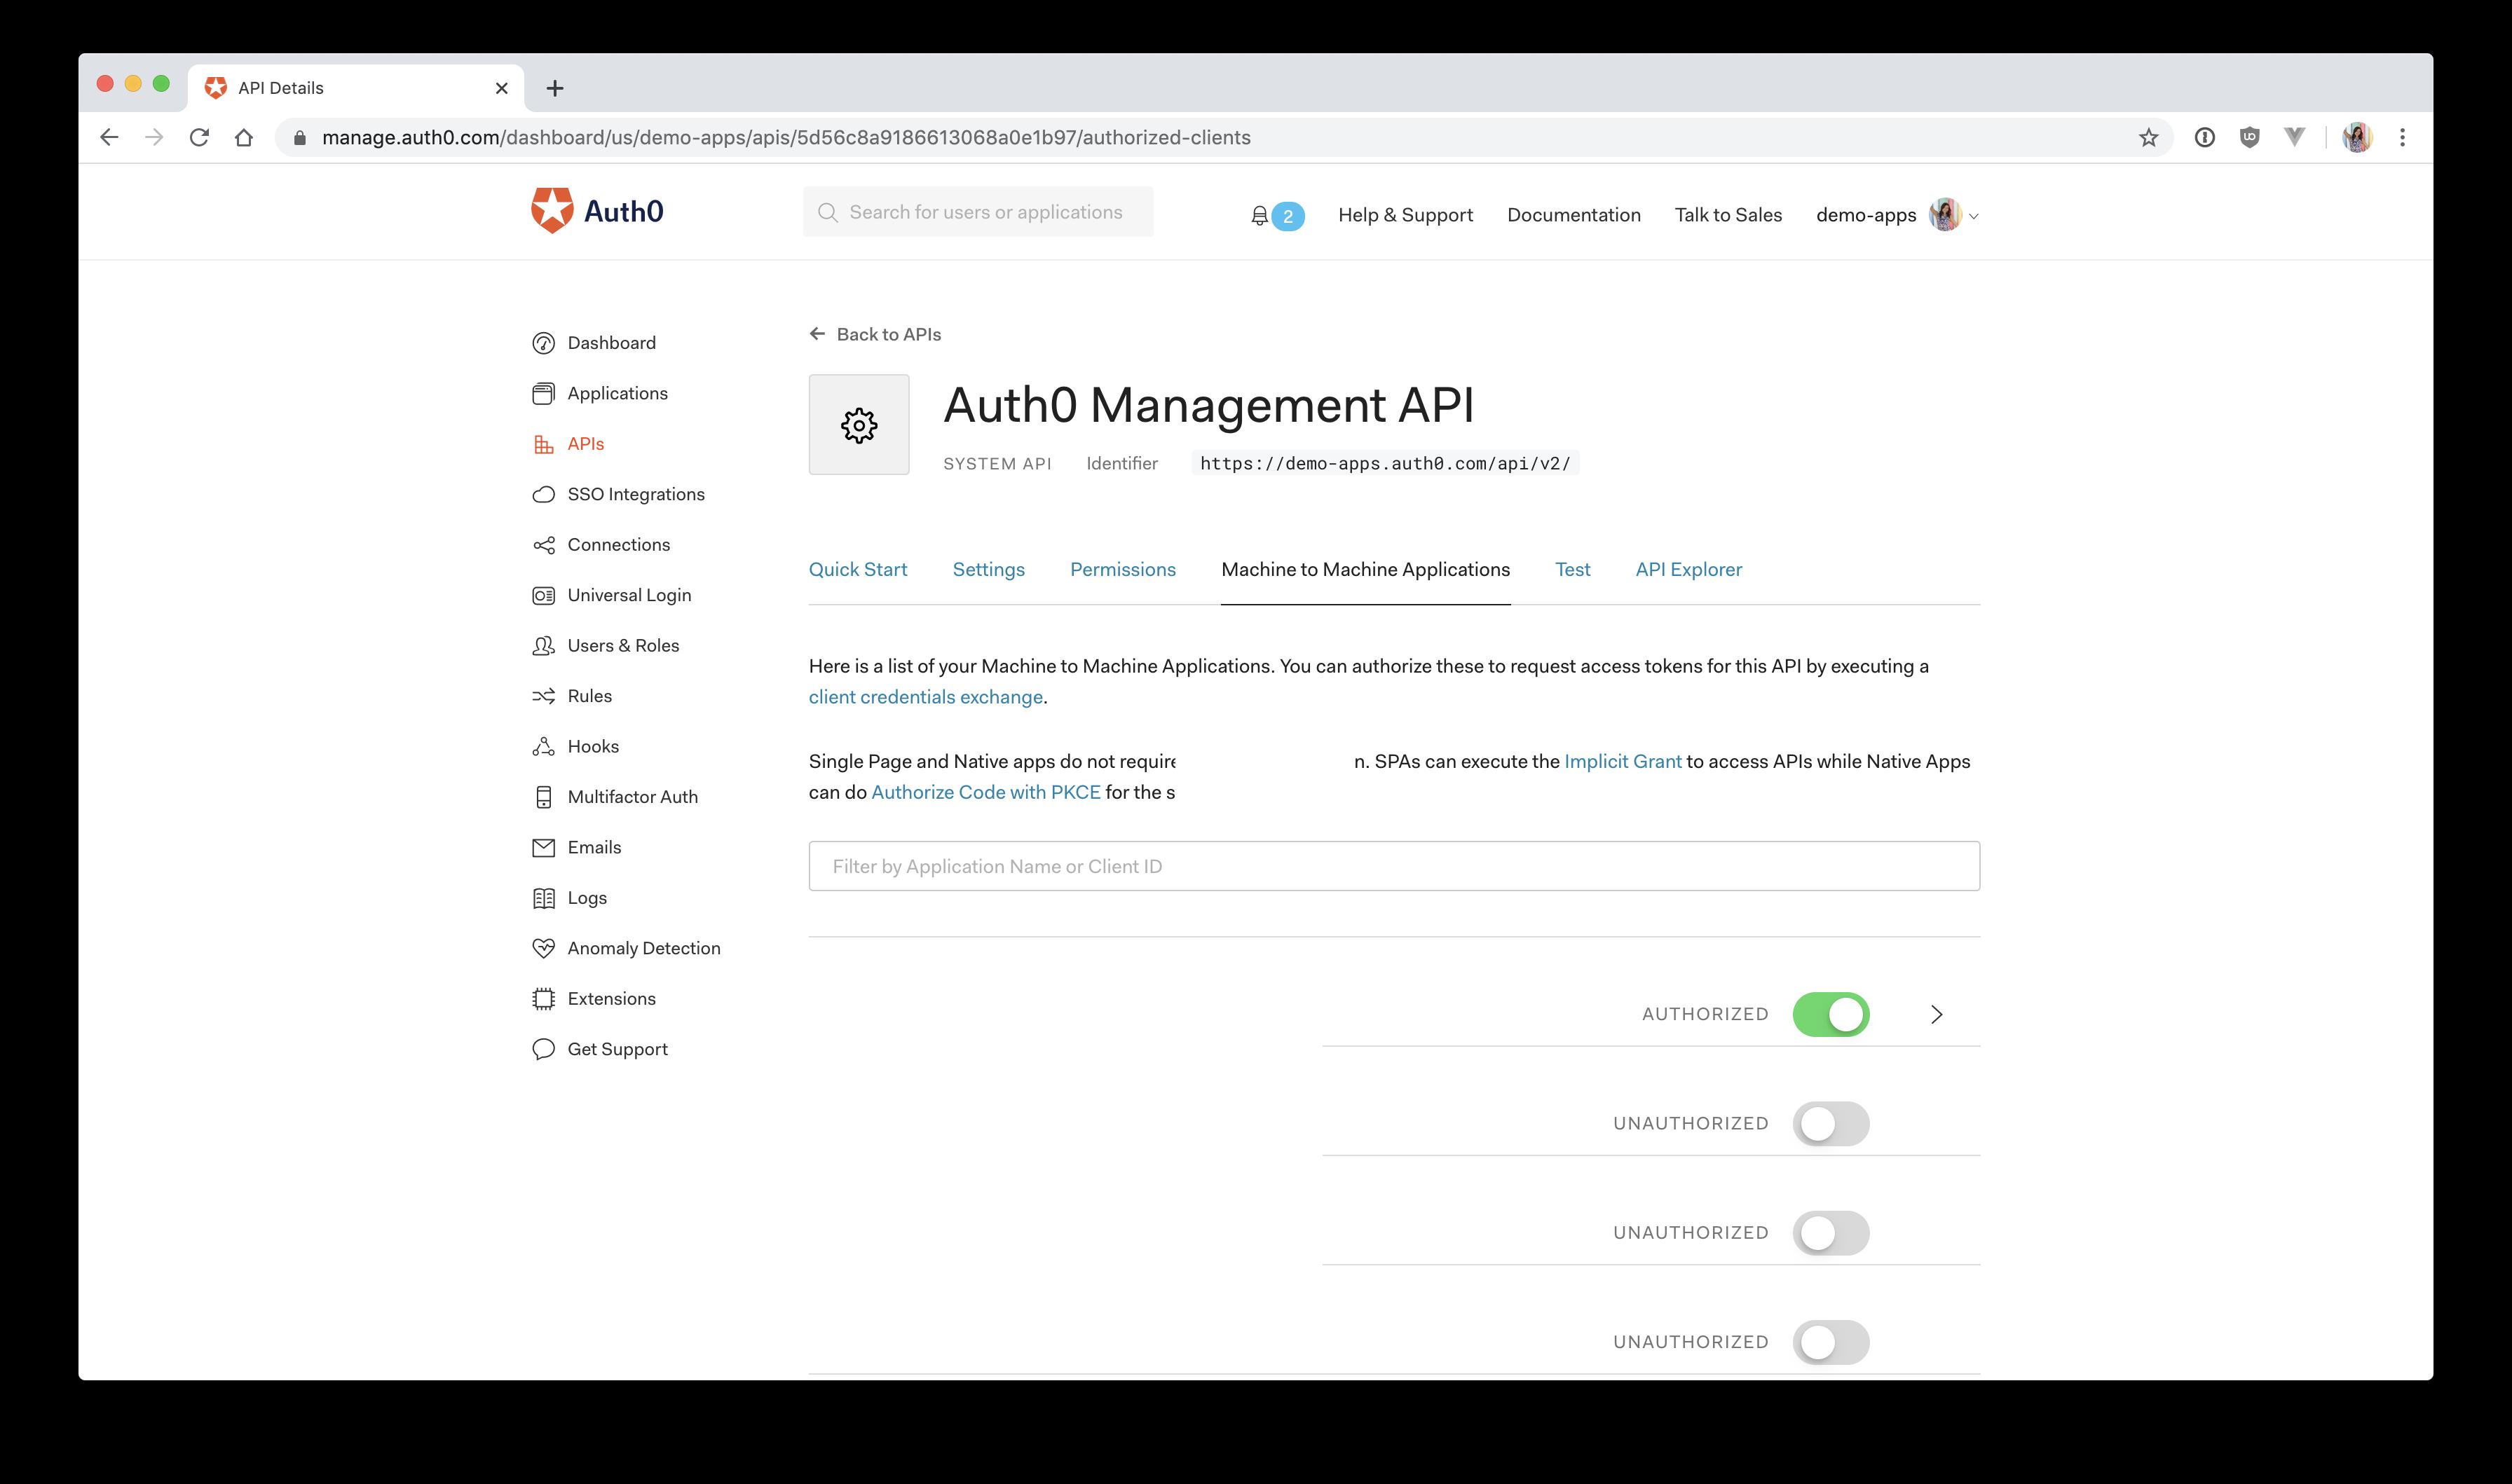 Auth0 authorized API